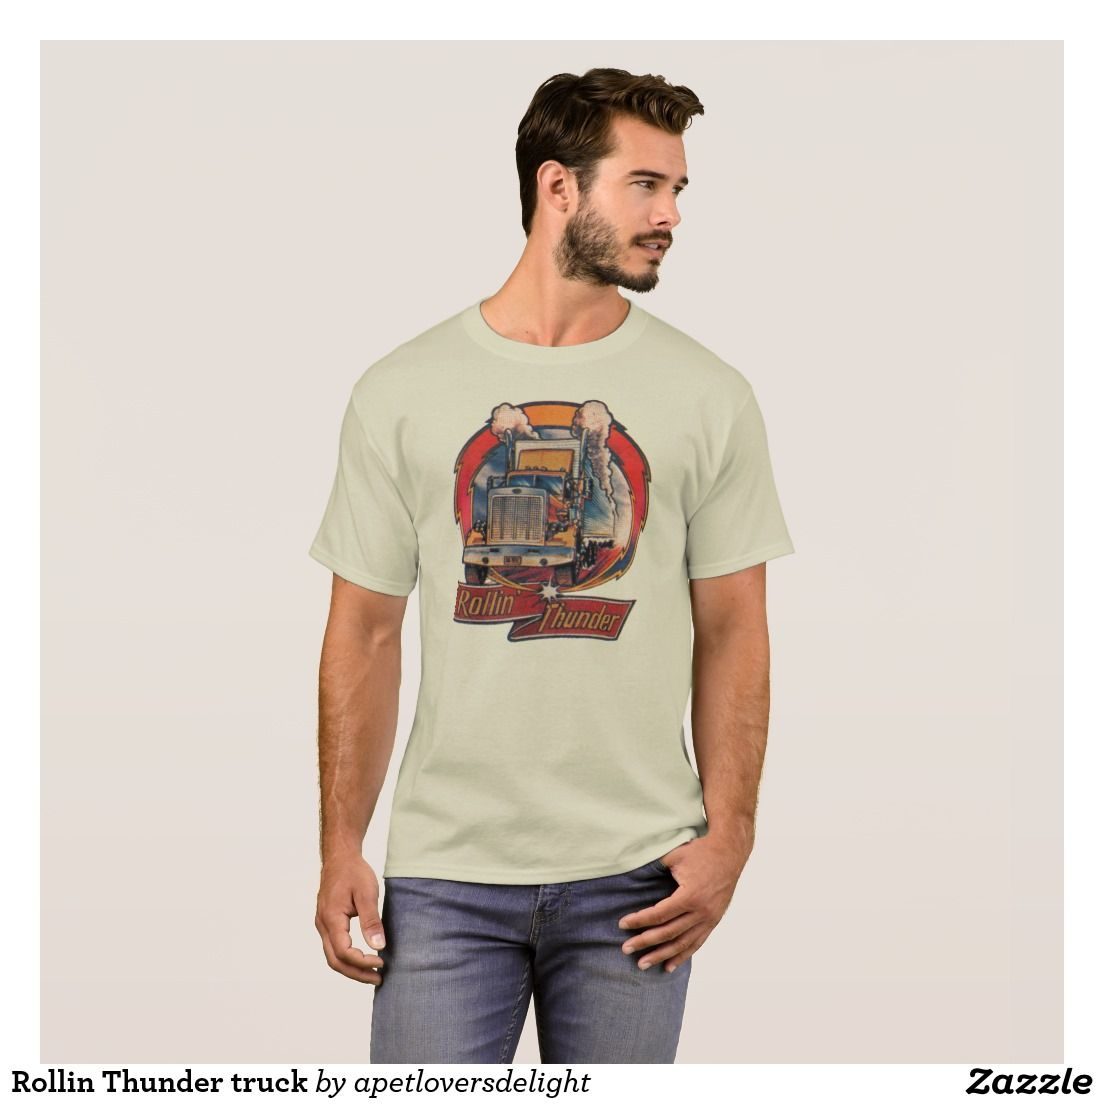 Rollin Thunder truck T-Shirt   T shirt, Shirt designs, Shirts